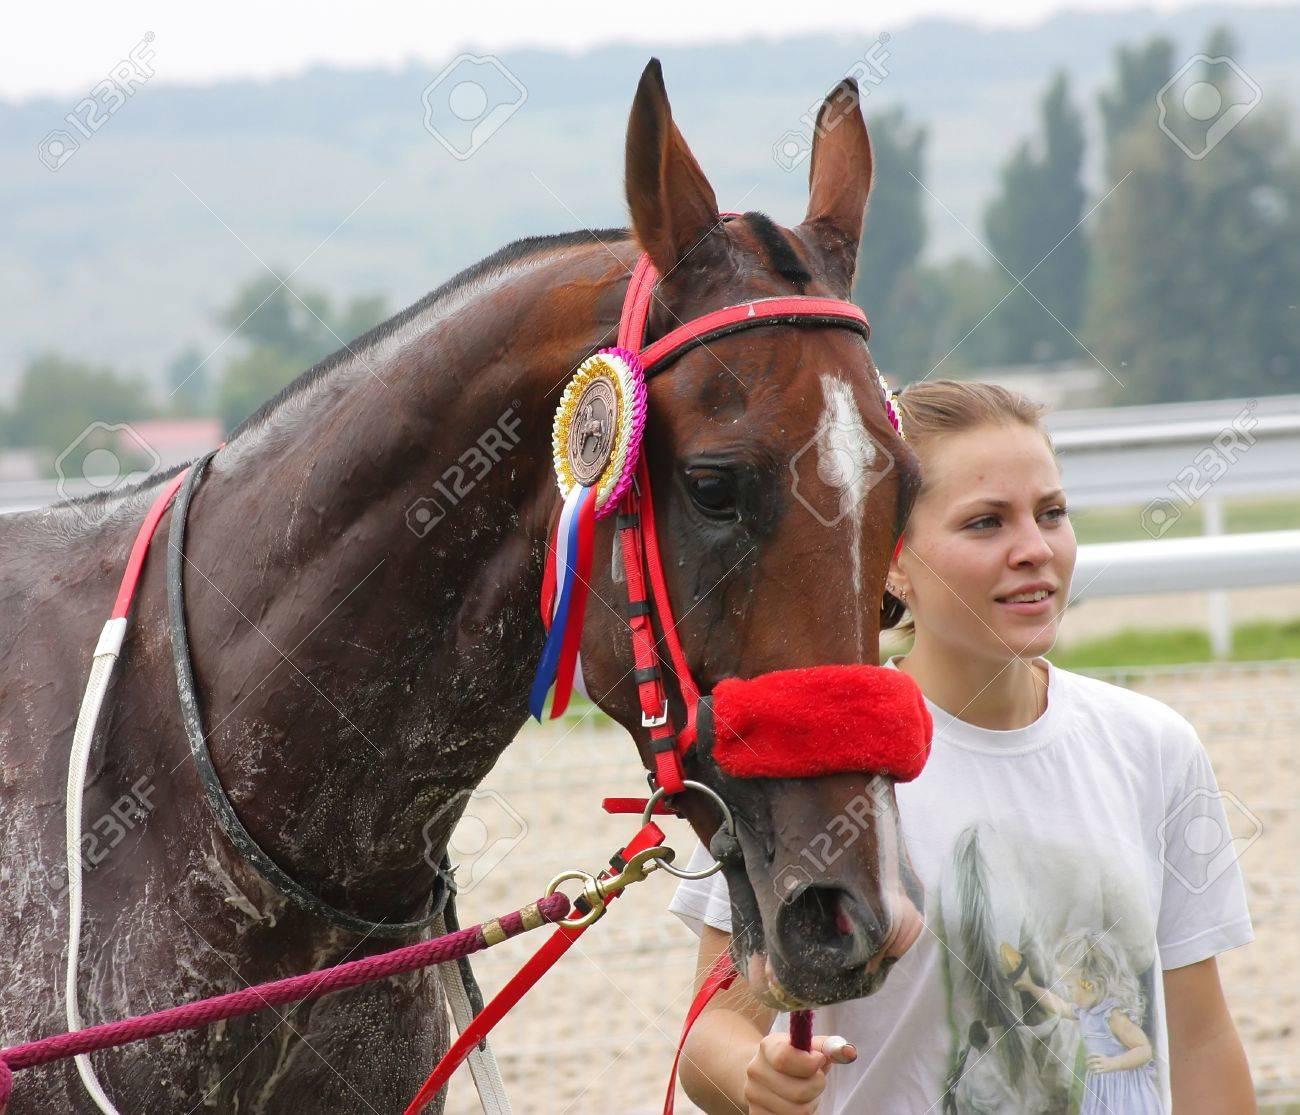 PYATIGORSK, RUSSIA - SEPTEMBER 4: An unidentified groom and akhal-teke horse, bay stallion Odjar after race for the prize of Drujbi narodov on September 4,2011 in Pyatigorsk, Caucasus, Russia.  Stock Photo - 10499719